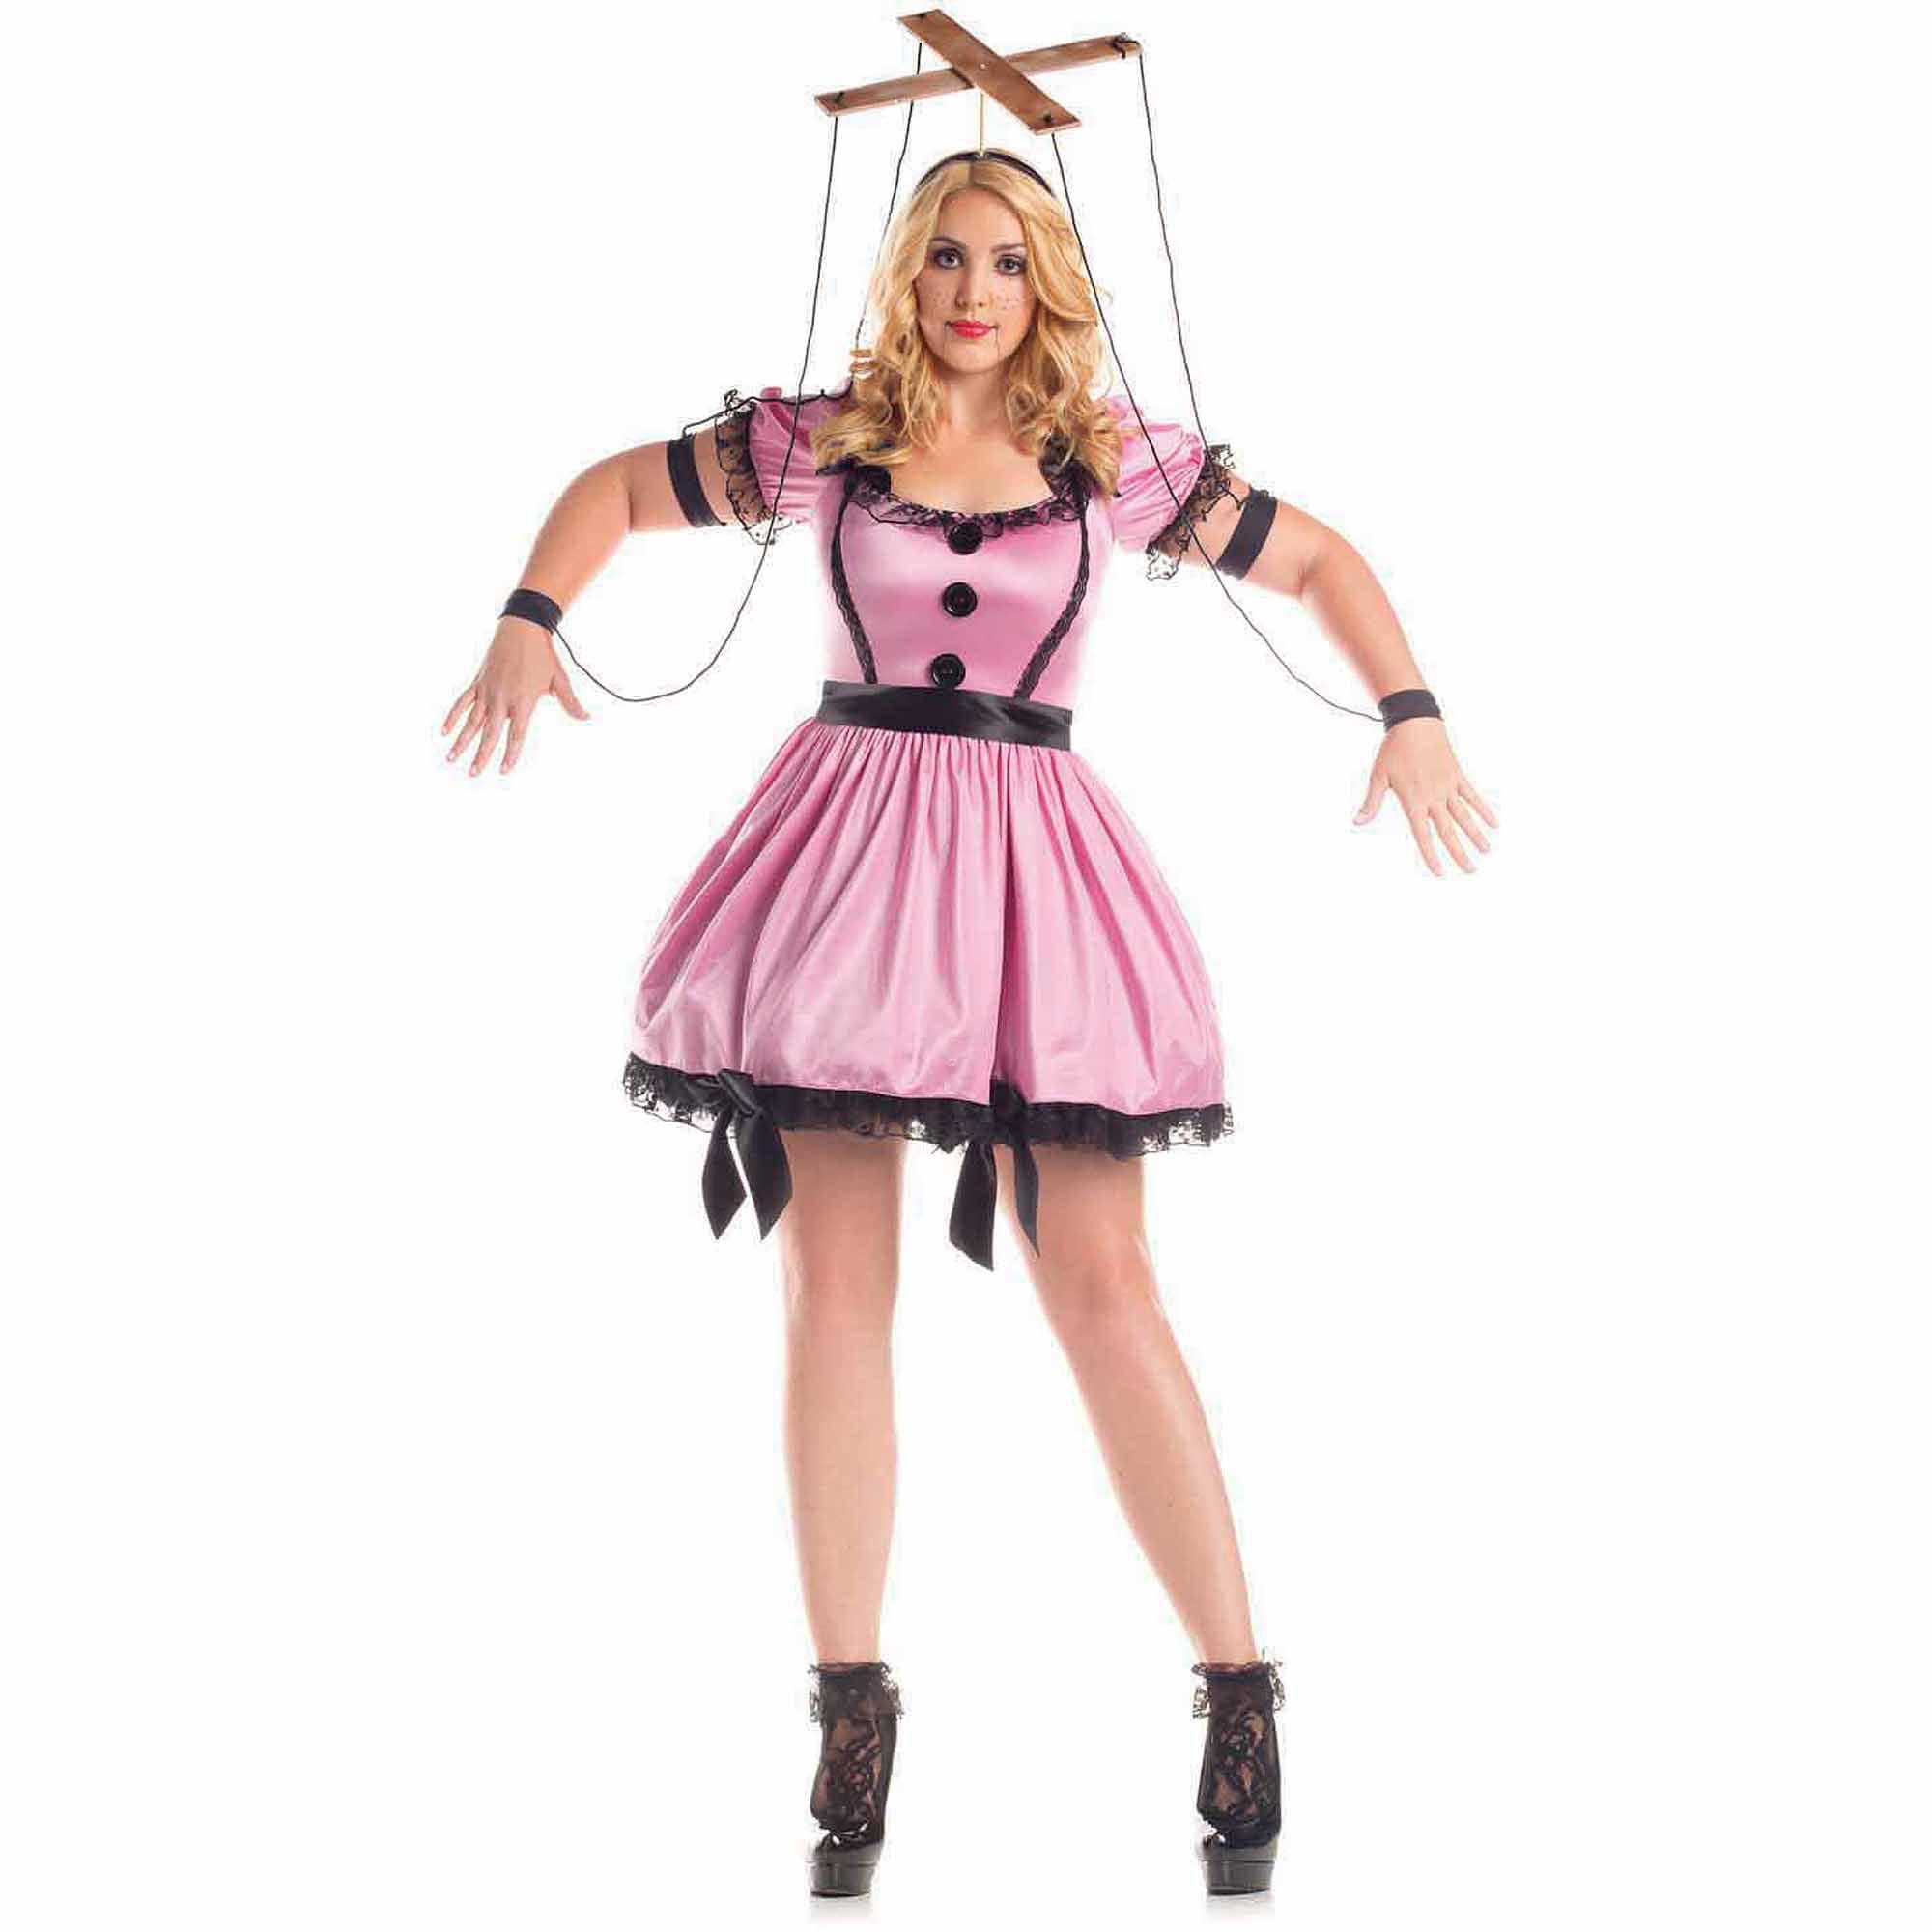 Women's Plus Size Pink Marionette Costume - Walmart.com